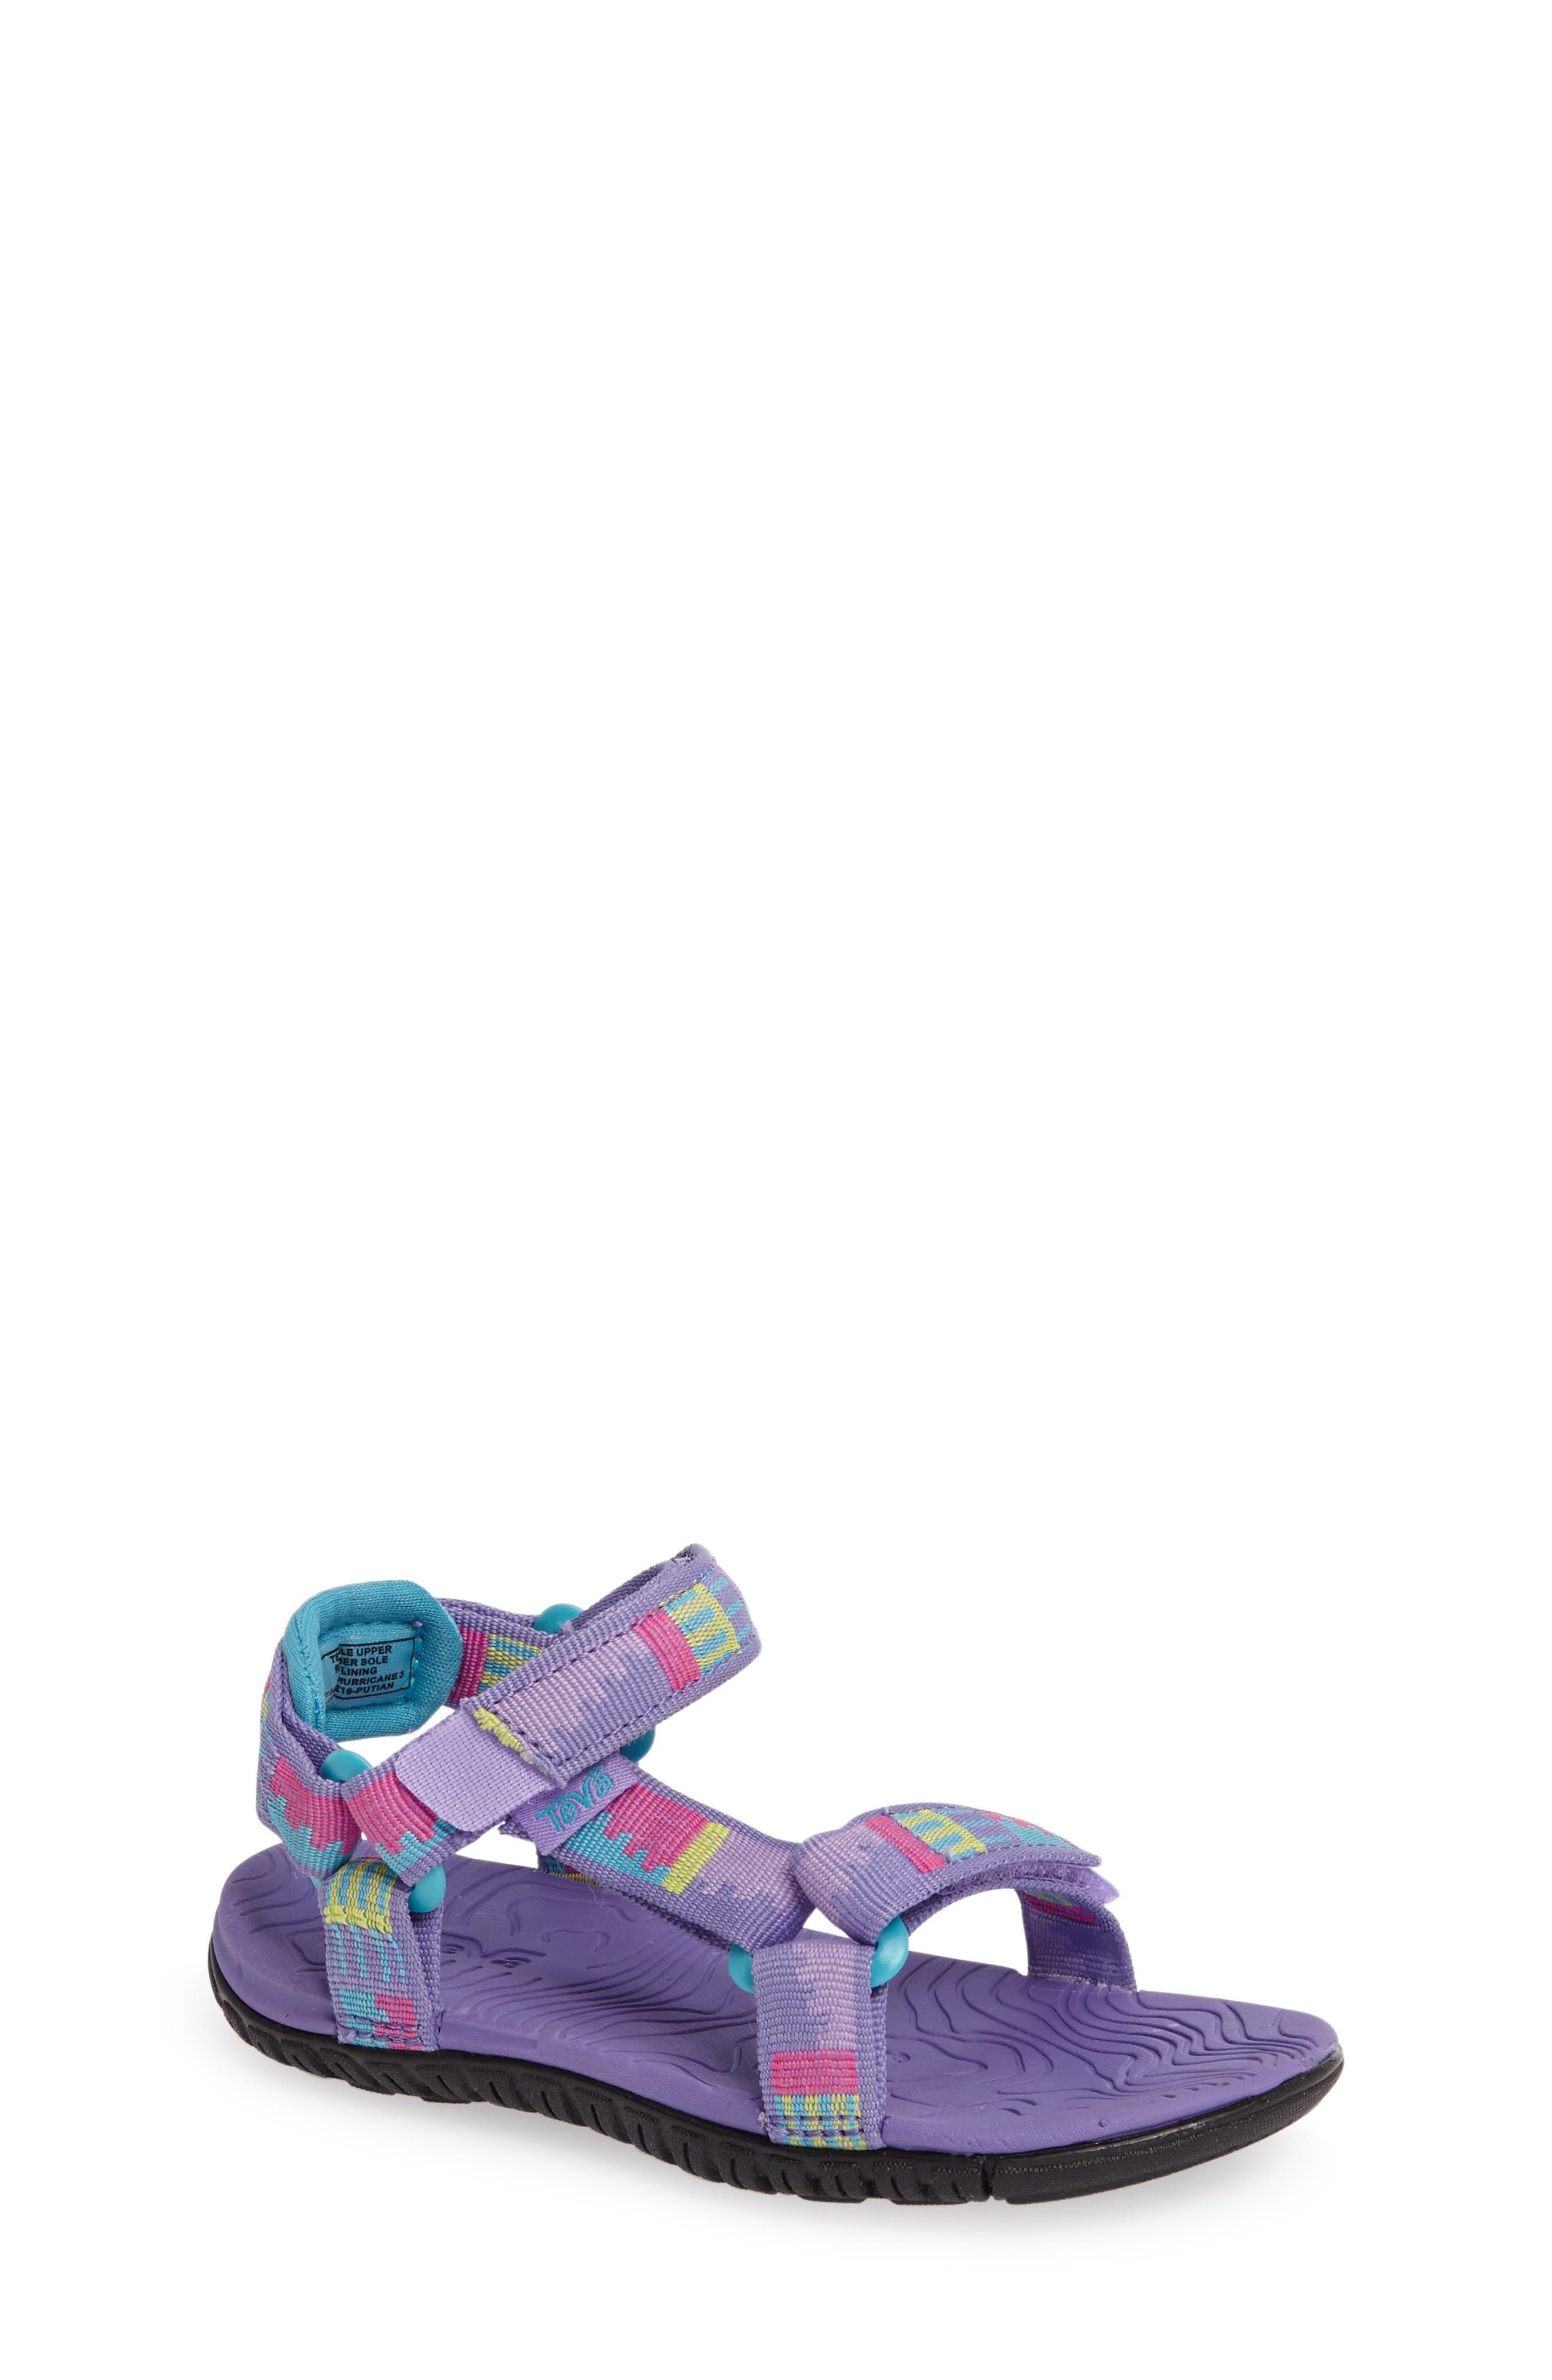 'Hurricane 3' Sport Sandal,                             Main thumbnail 1, color,                             Purple